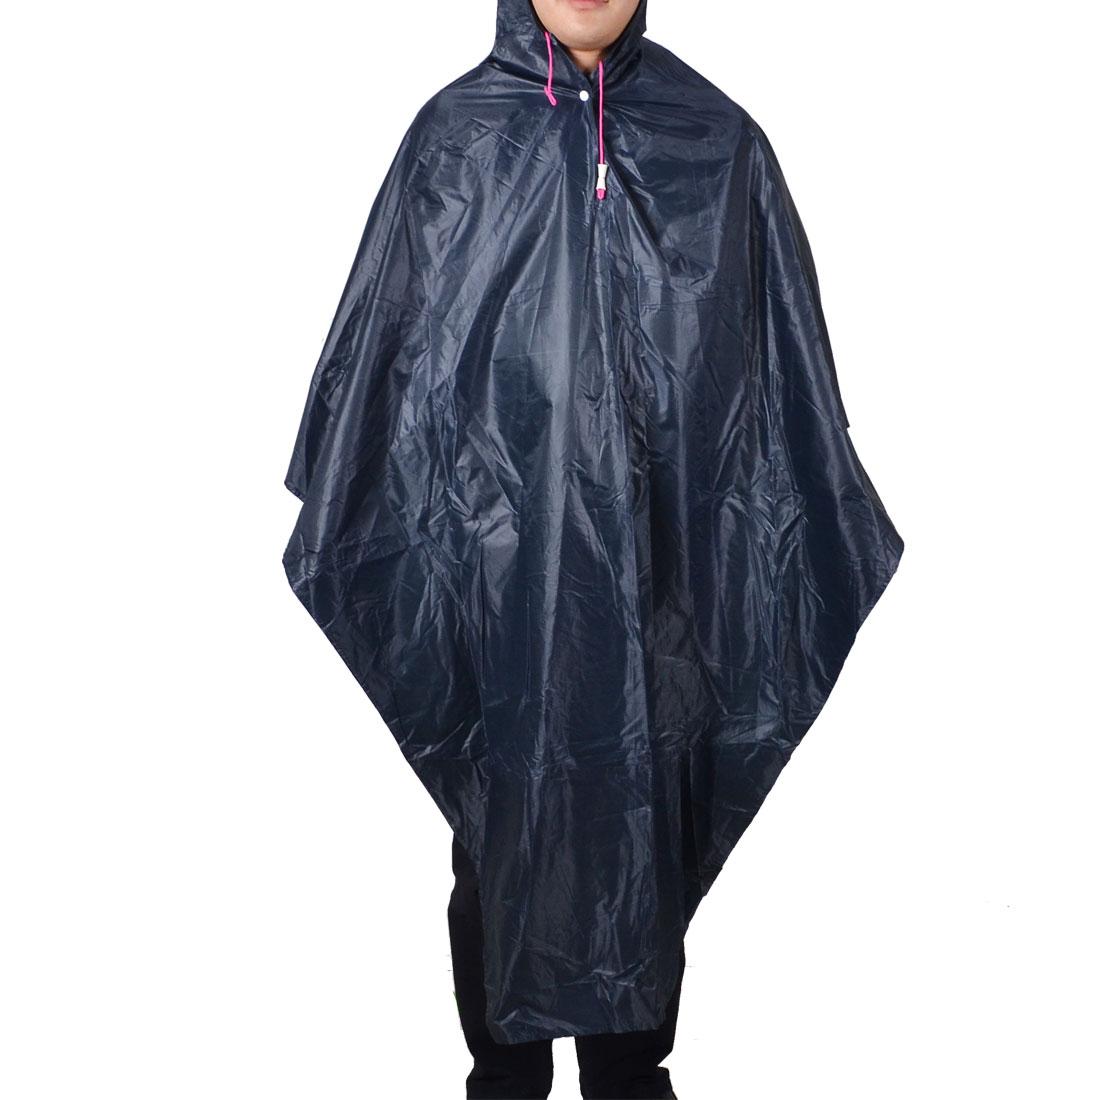 Popular Pvc Poncho Raincoat-Buy Cheap Pvc Poncho Raincoat